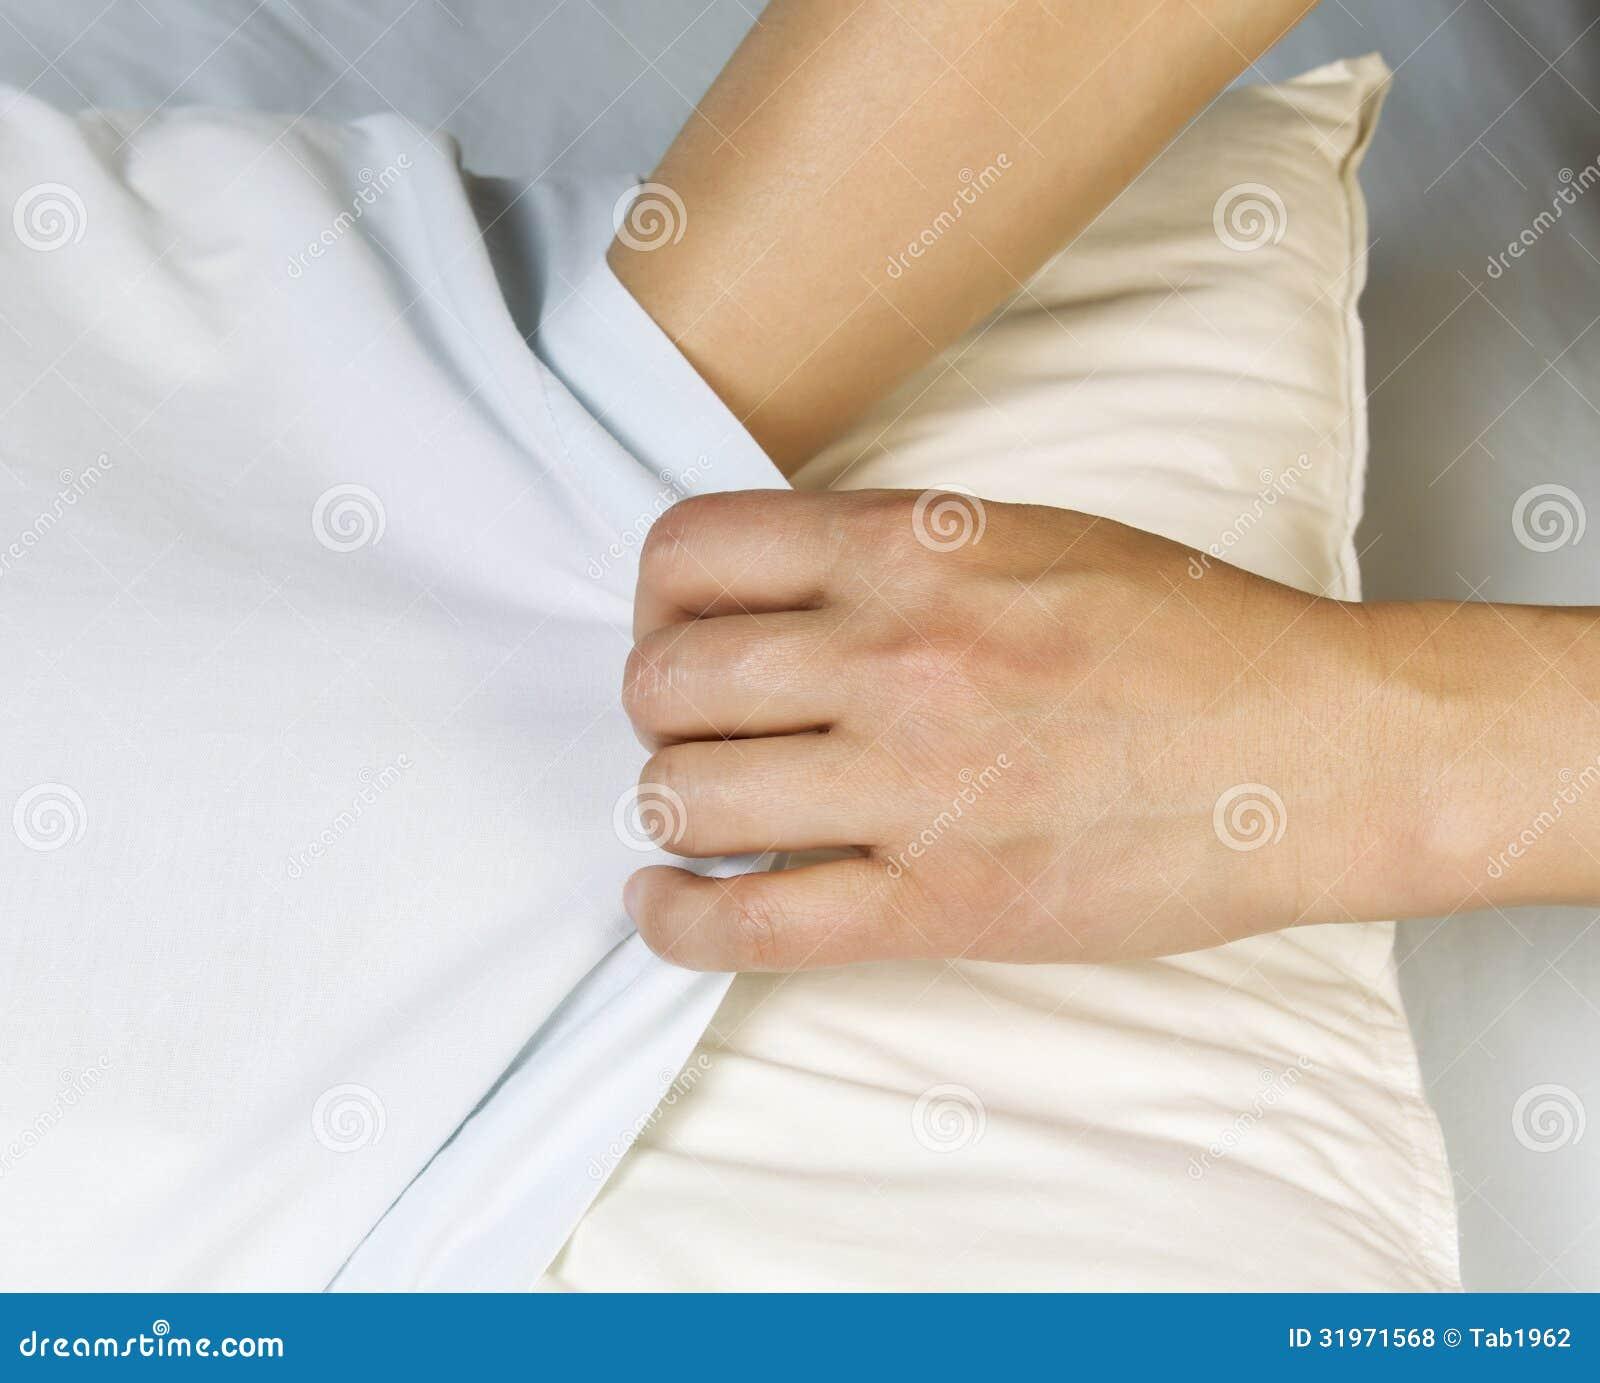 putting clean pilllow case on pillow stock photo image of mattress